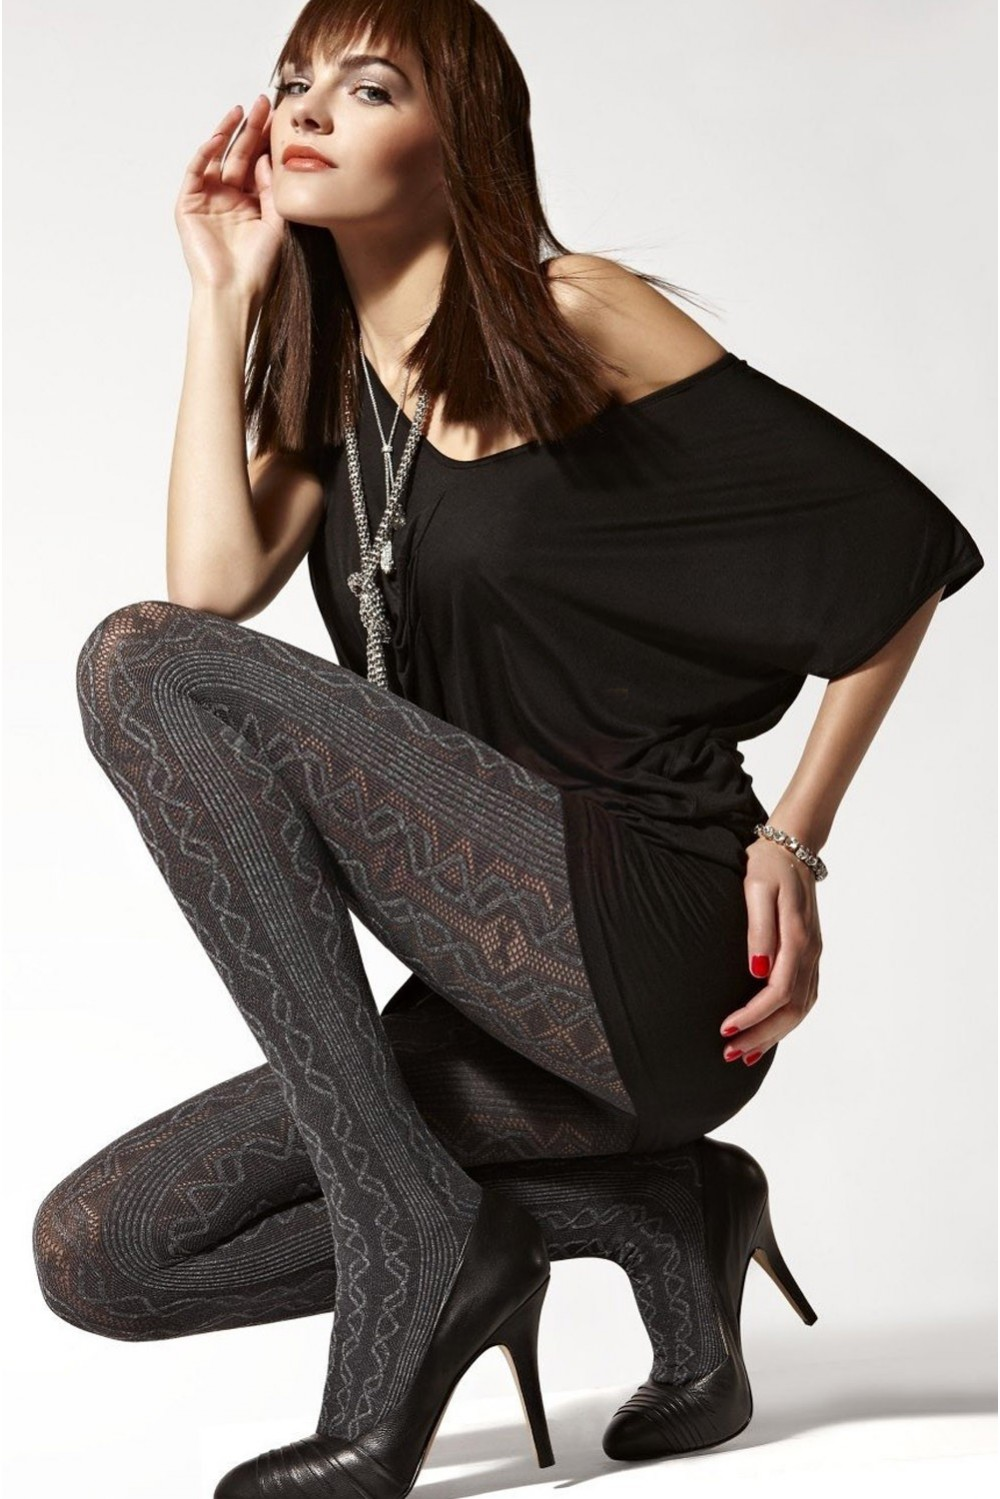 fashion tights skirt dress heels : My amateur pantyhose ...